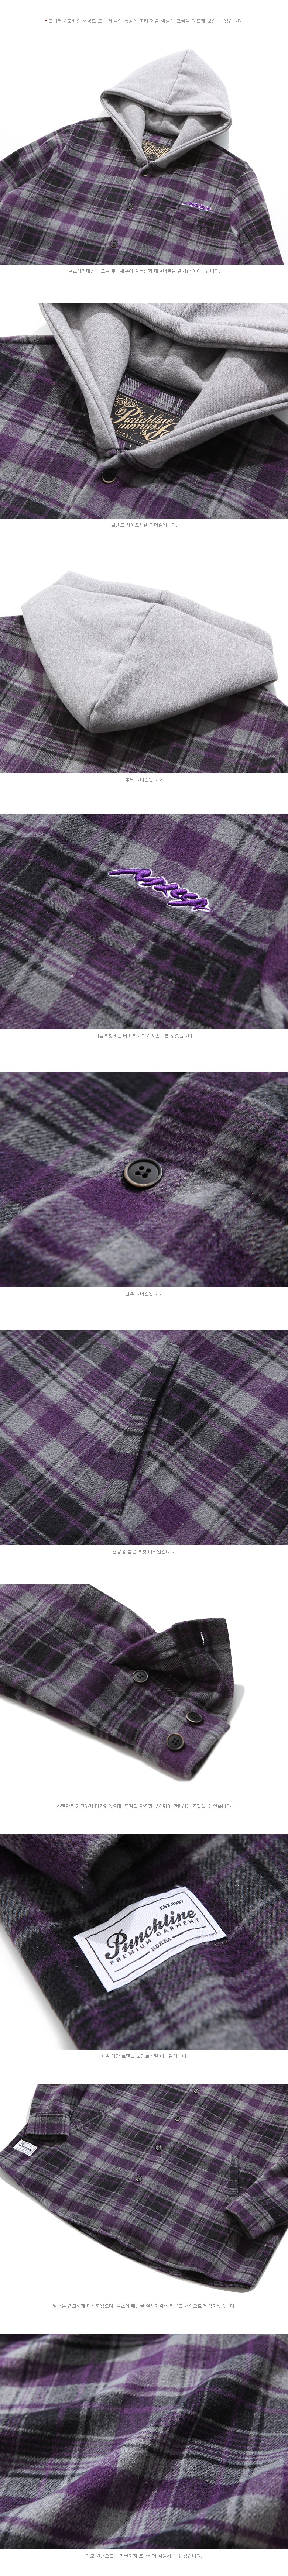 20180905_pl_KHLS6098_detail_purple_02.jpg